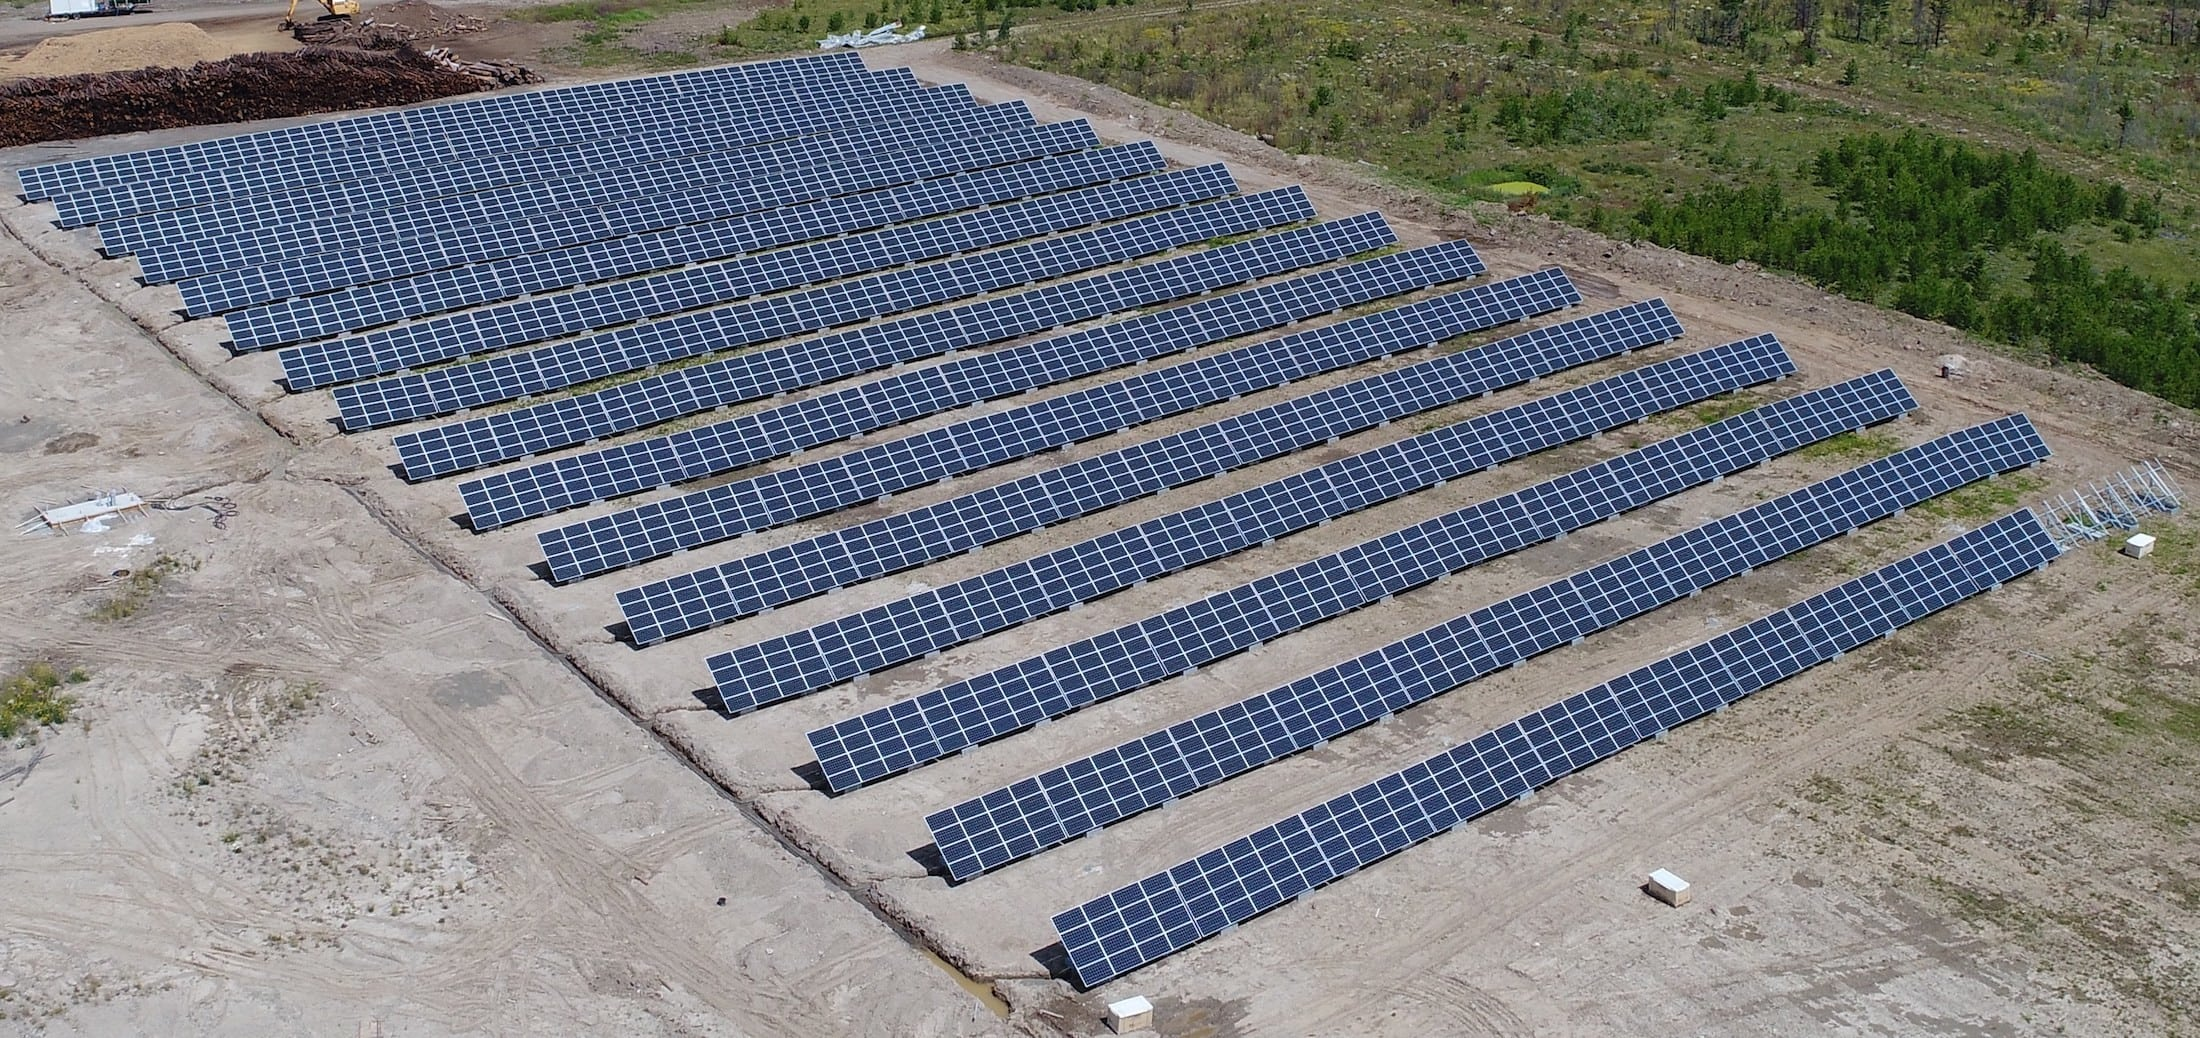 Tsilhqot'in Solar Farm